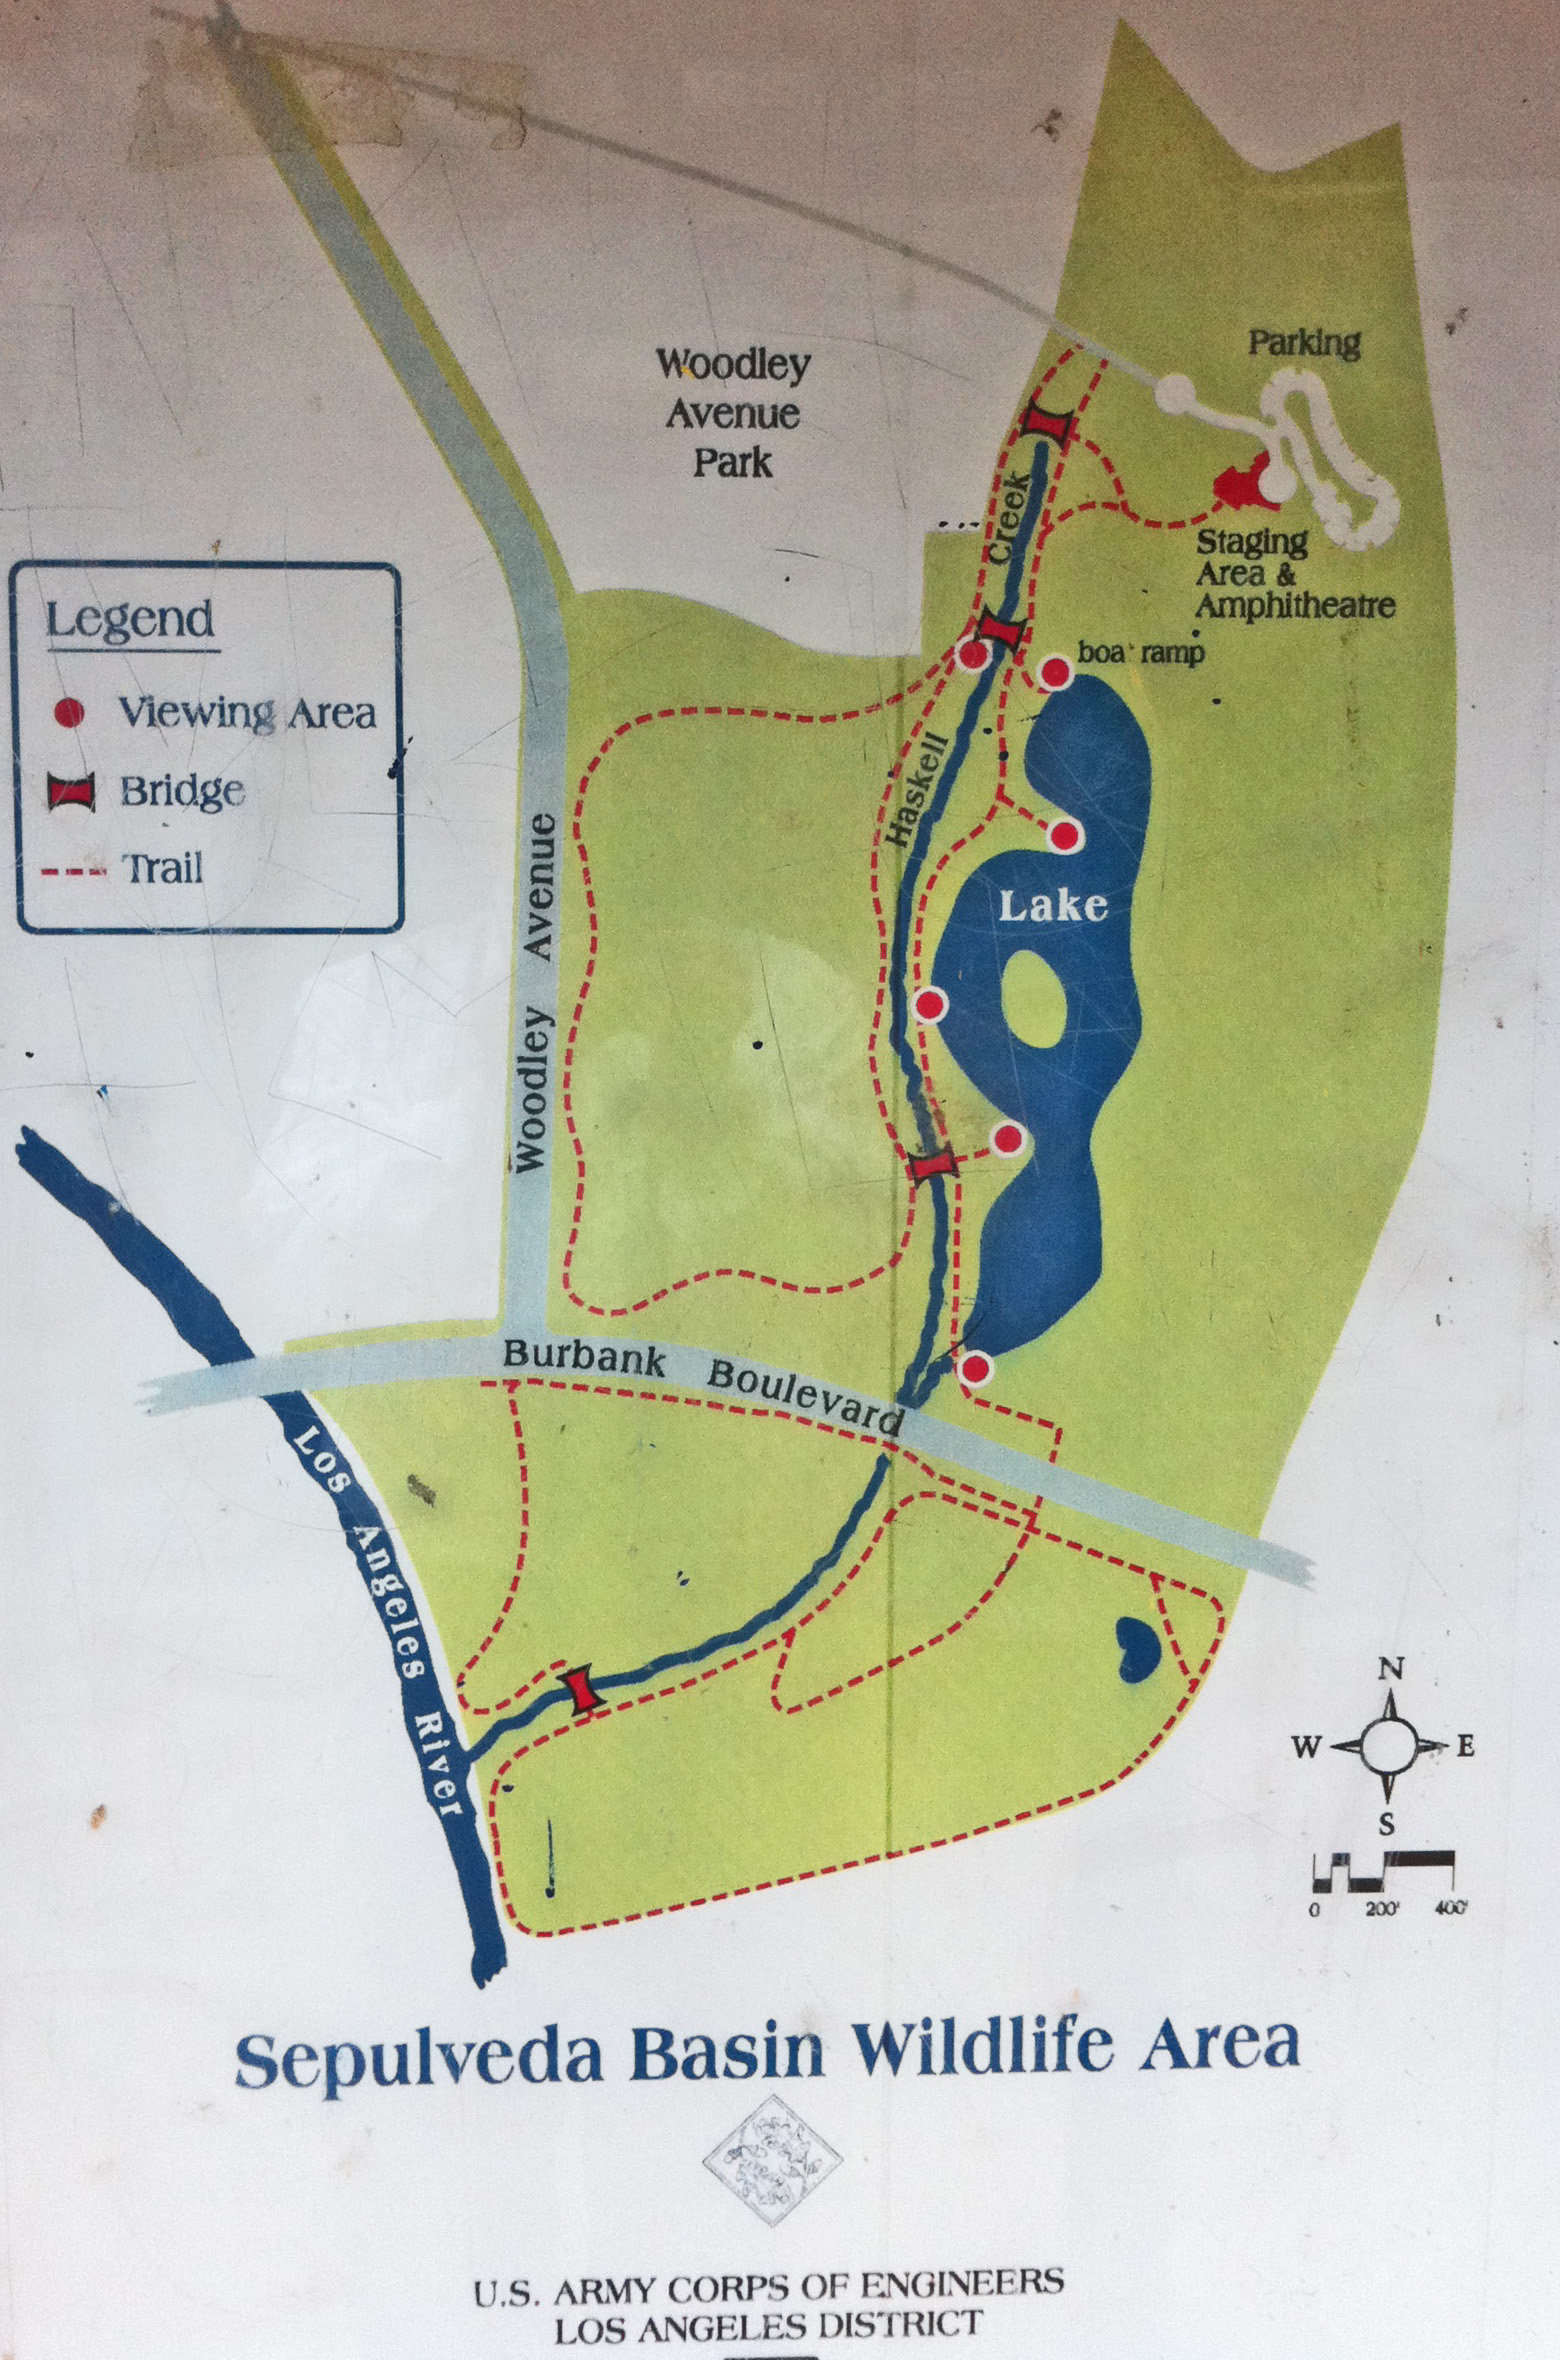 SepulvedaBasinWildlife.org California Mission Trail Map on